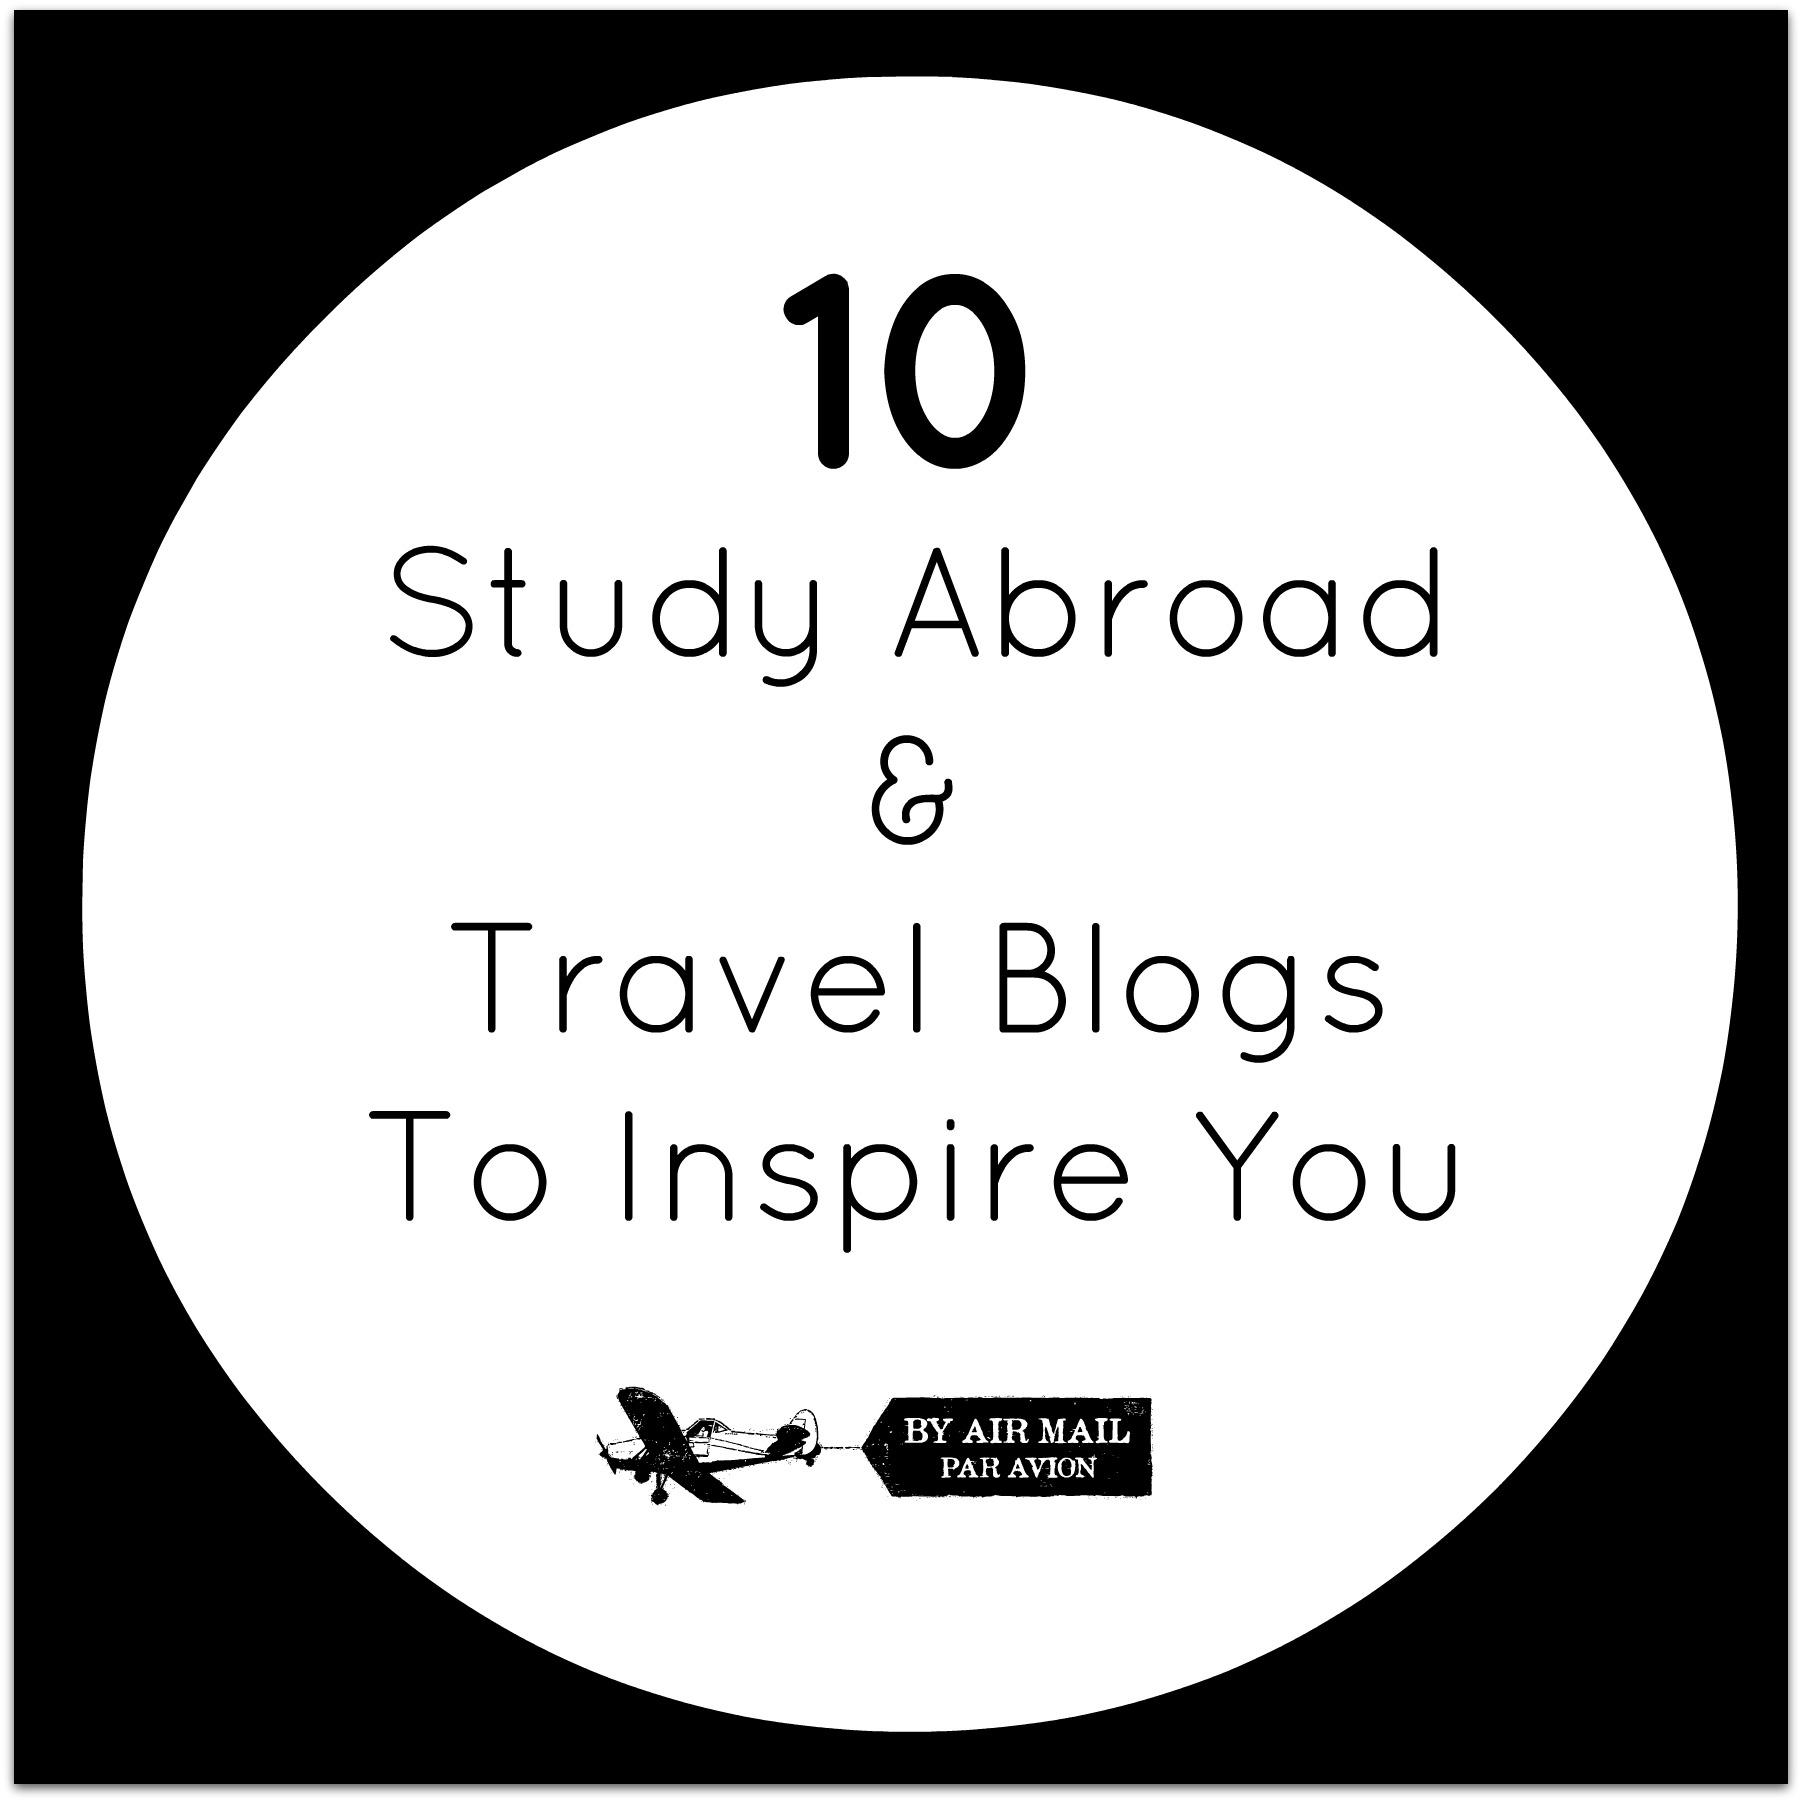 Blogs on StudyAbroad.com